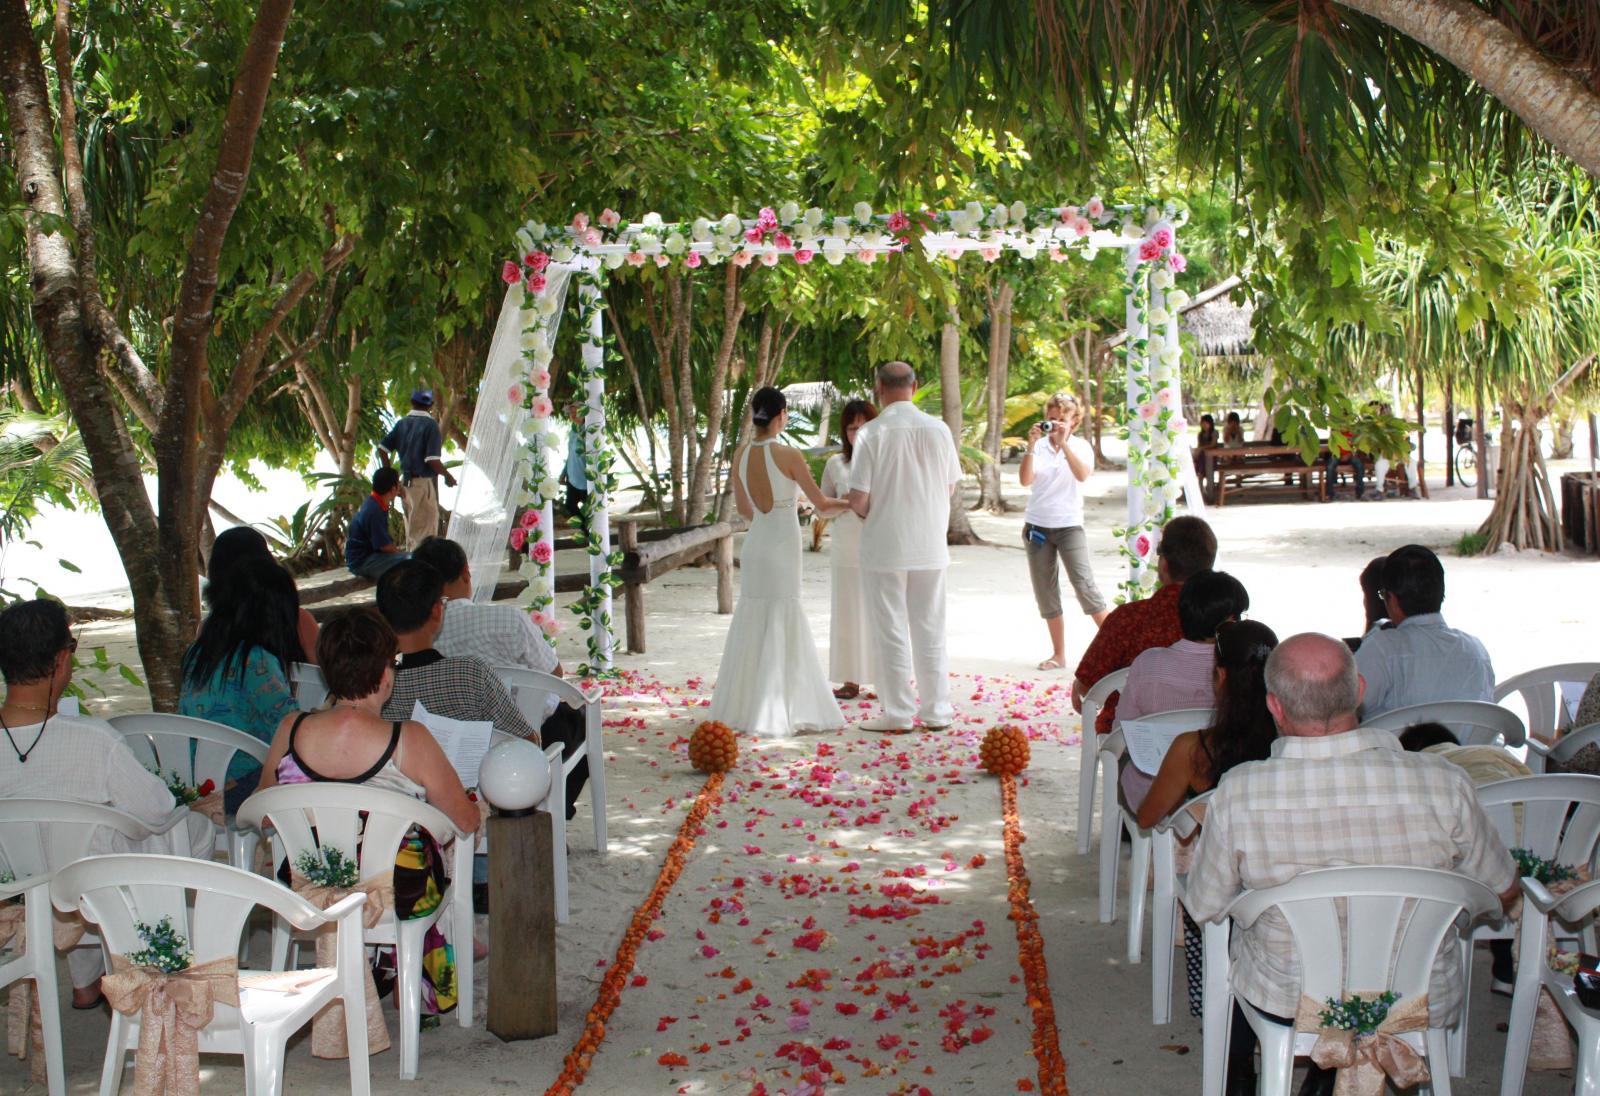 DIY wedding stuff (favours, ceremony, etc.) - Page 125 - Wedding ...